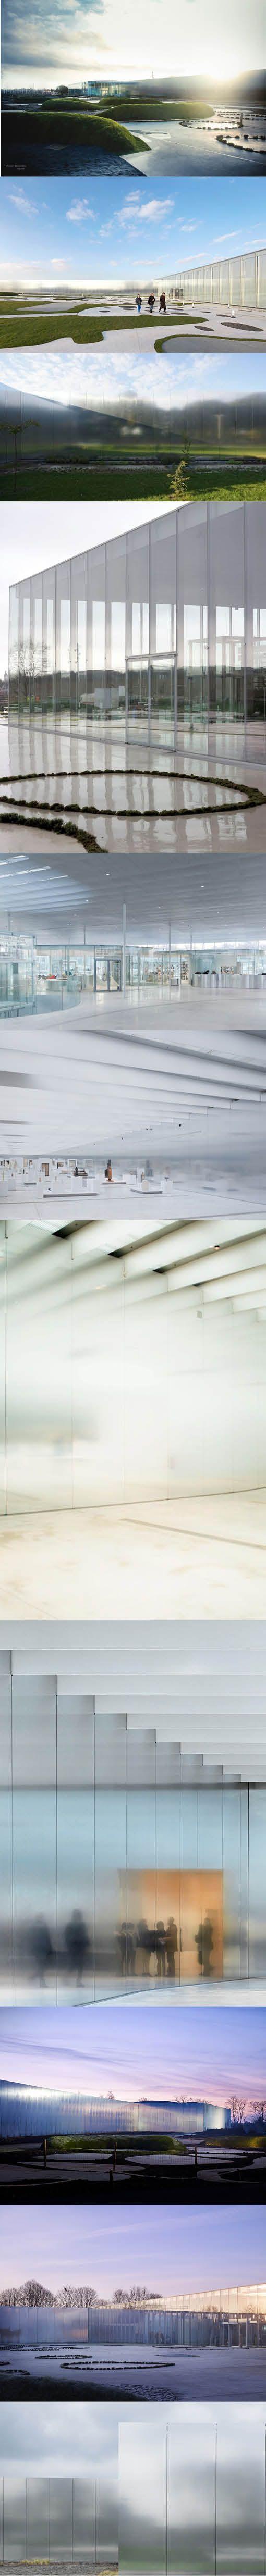 2012 Sanaa - Musee du Louvre-Lens / France / glass / mirror / Japan